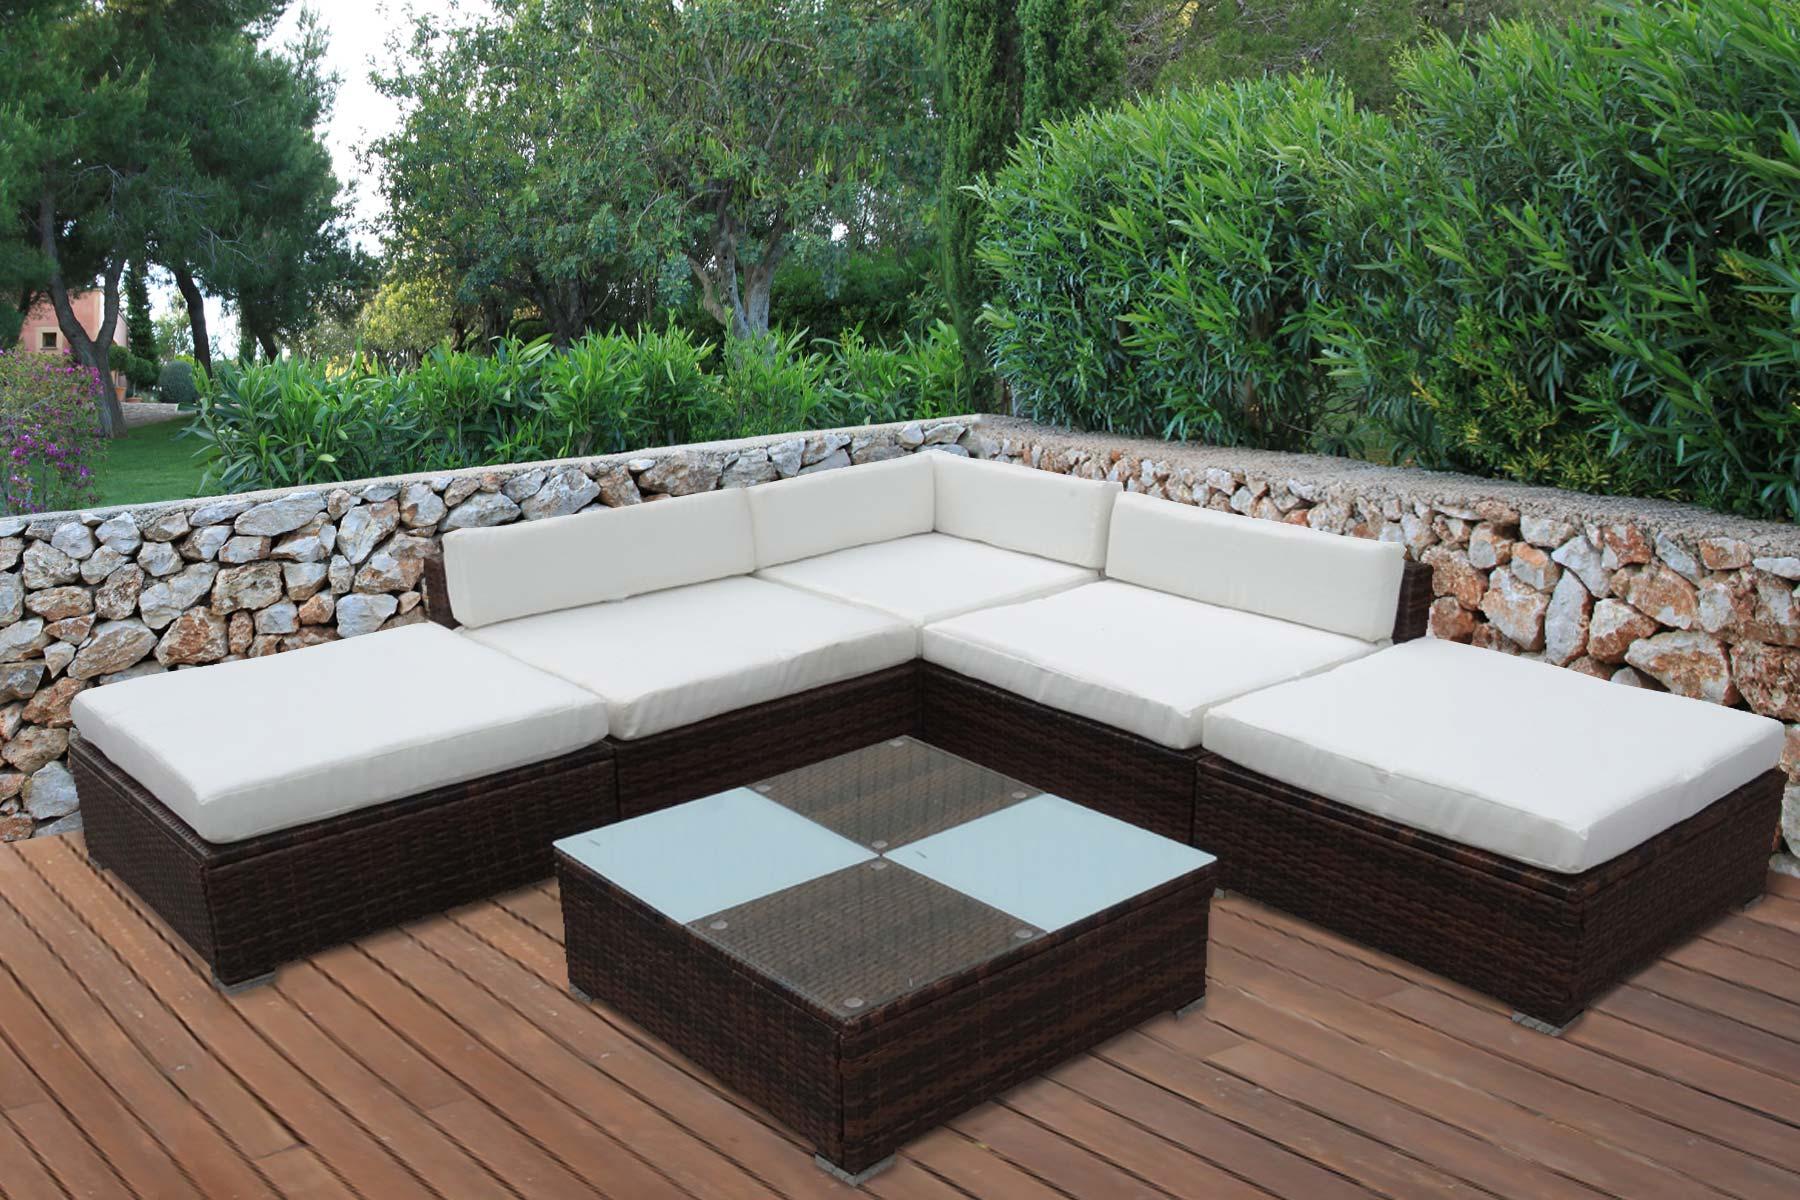 Garten rattan set aktion teuer hat hier shopverbot for Lounge garnitur outdoor